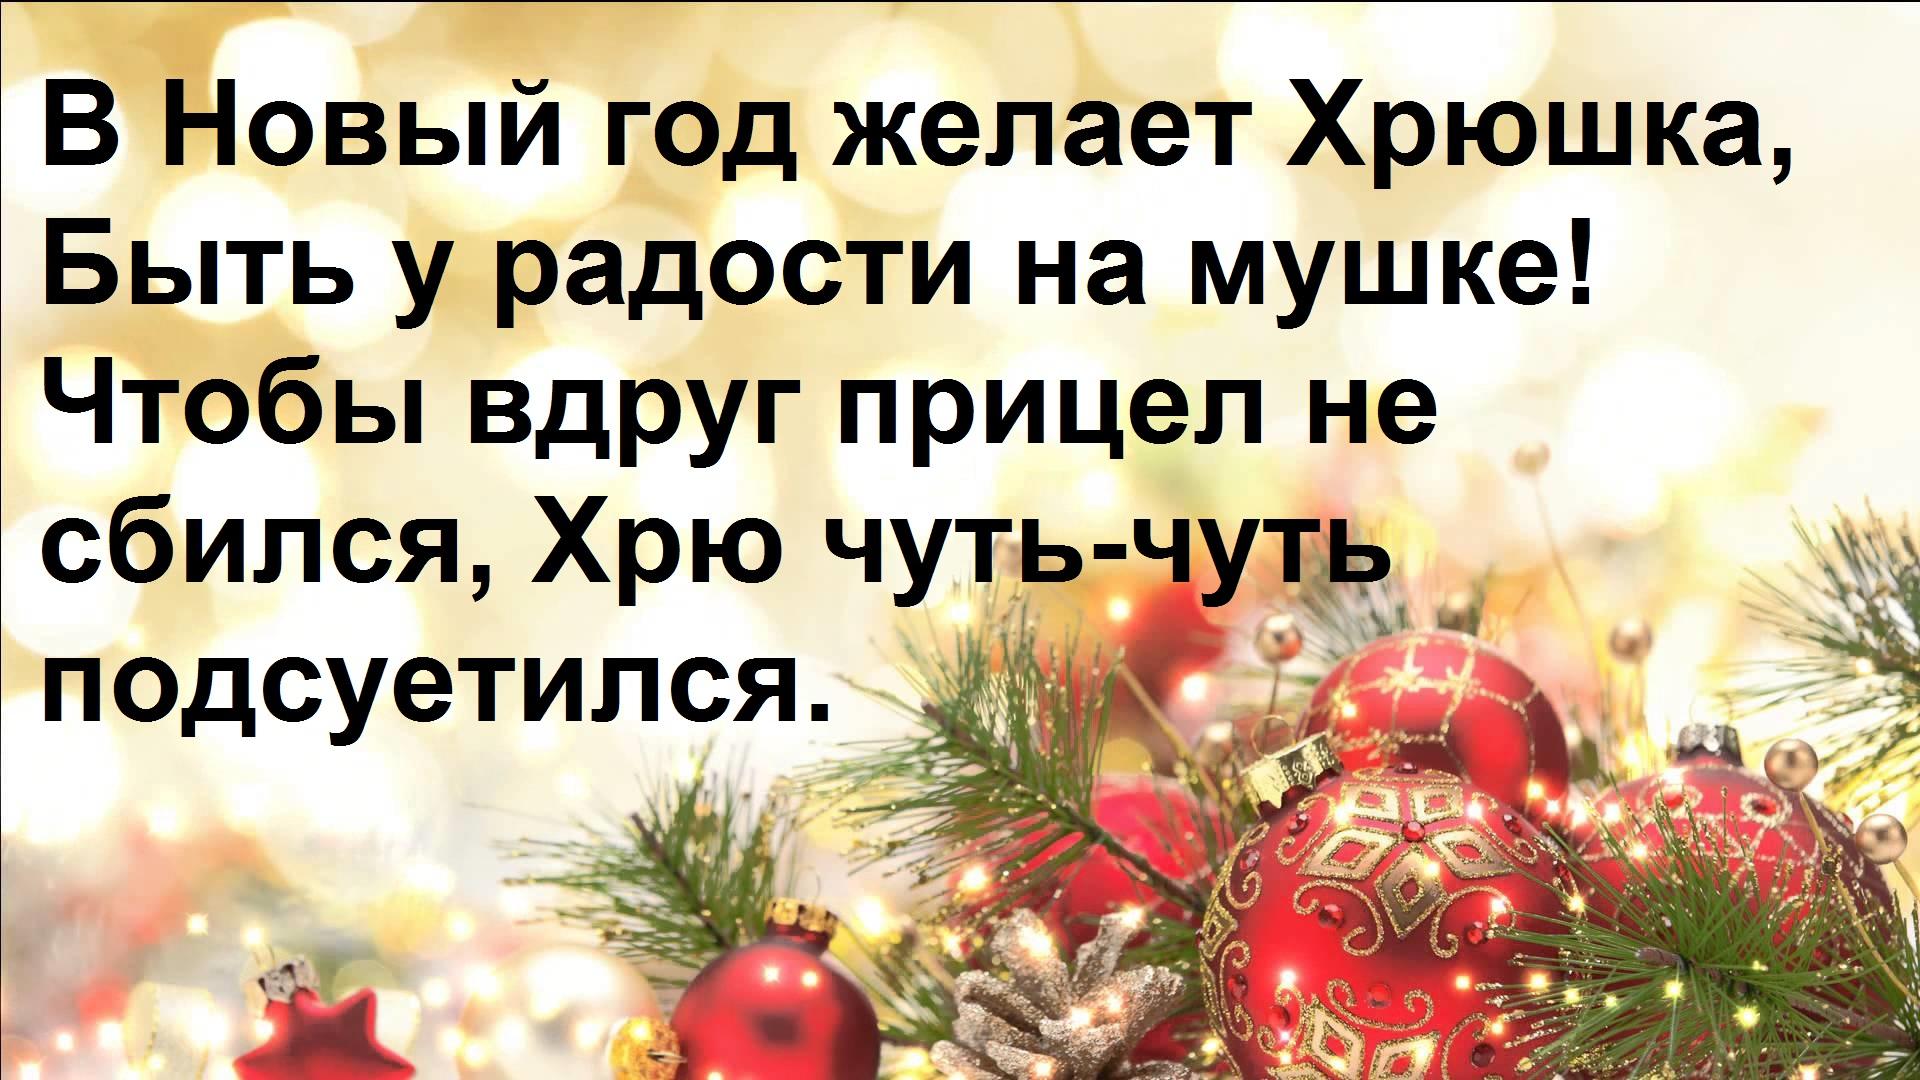 https://luckclub.ru/images/luckclub/2018/09/priksms2.jpg